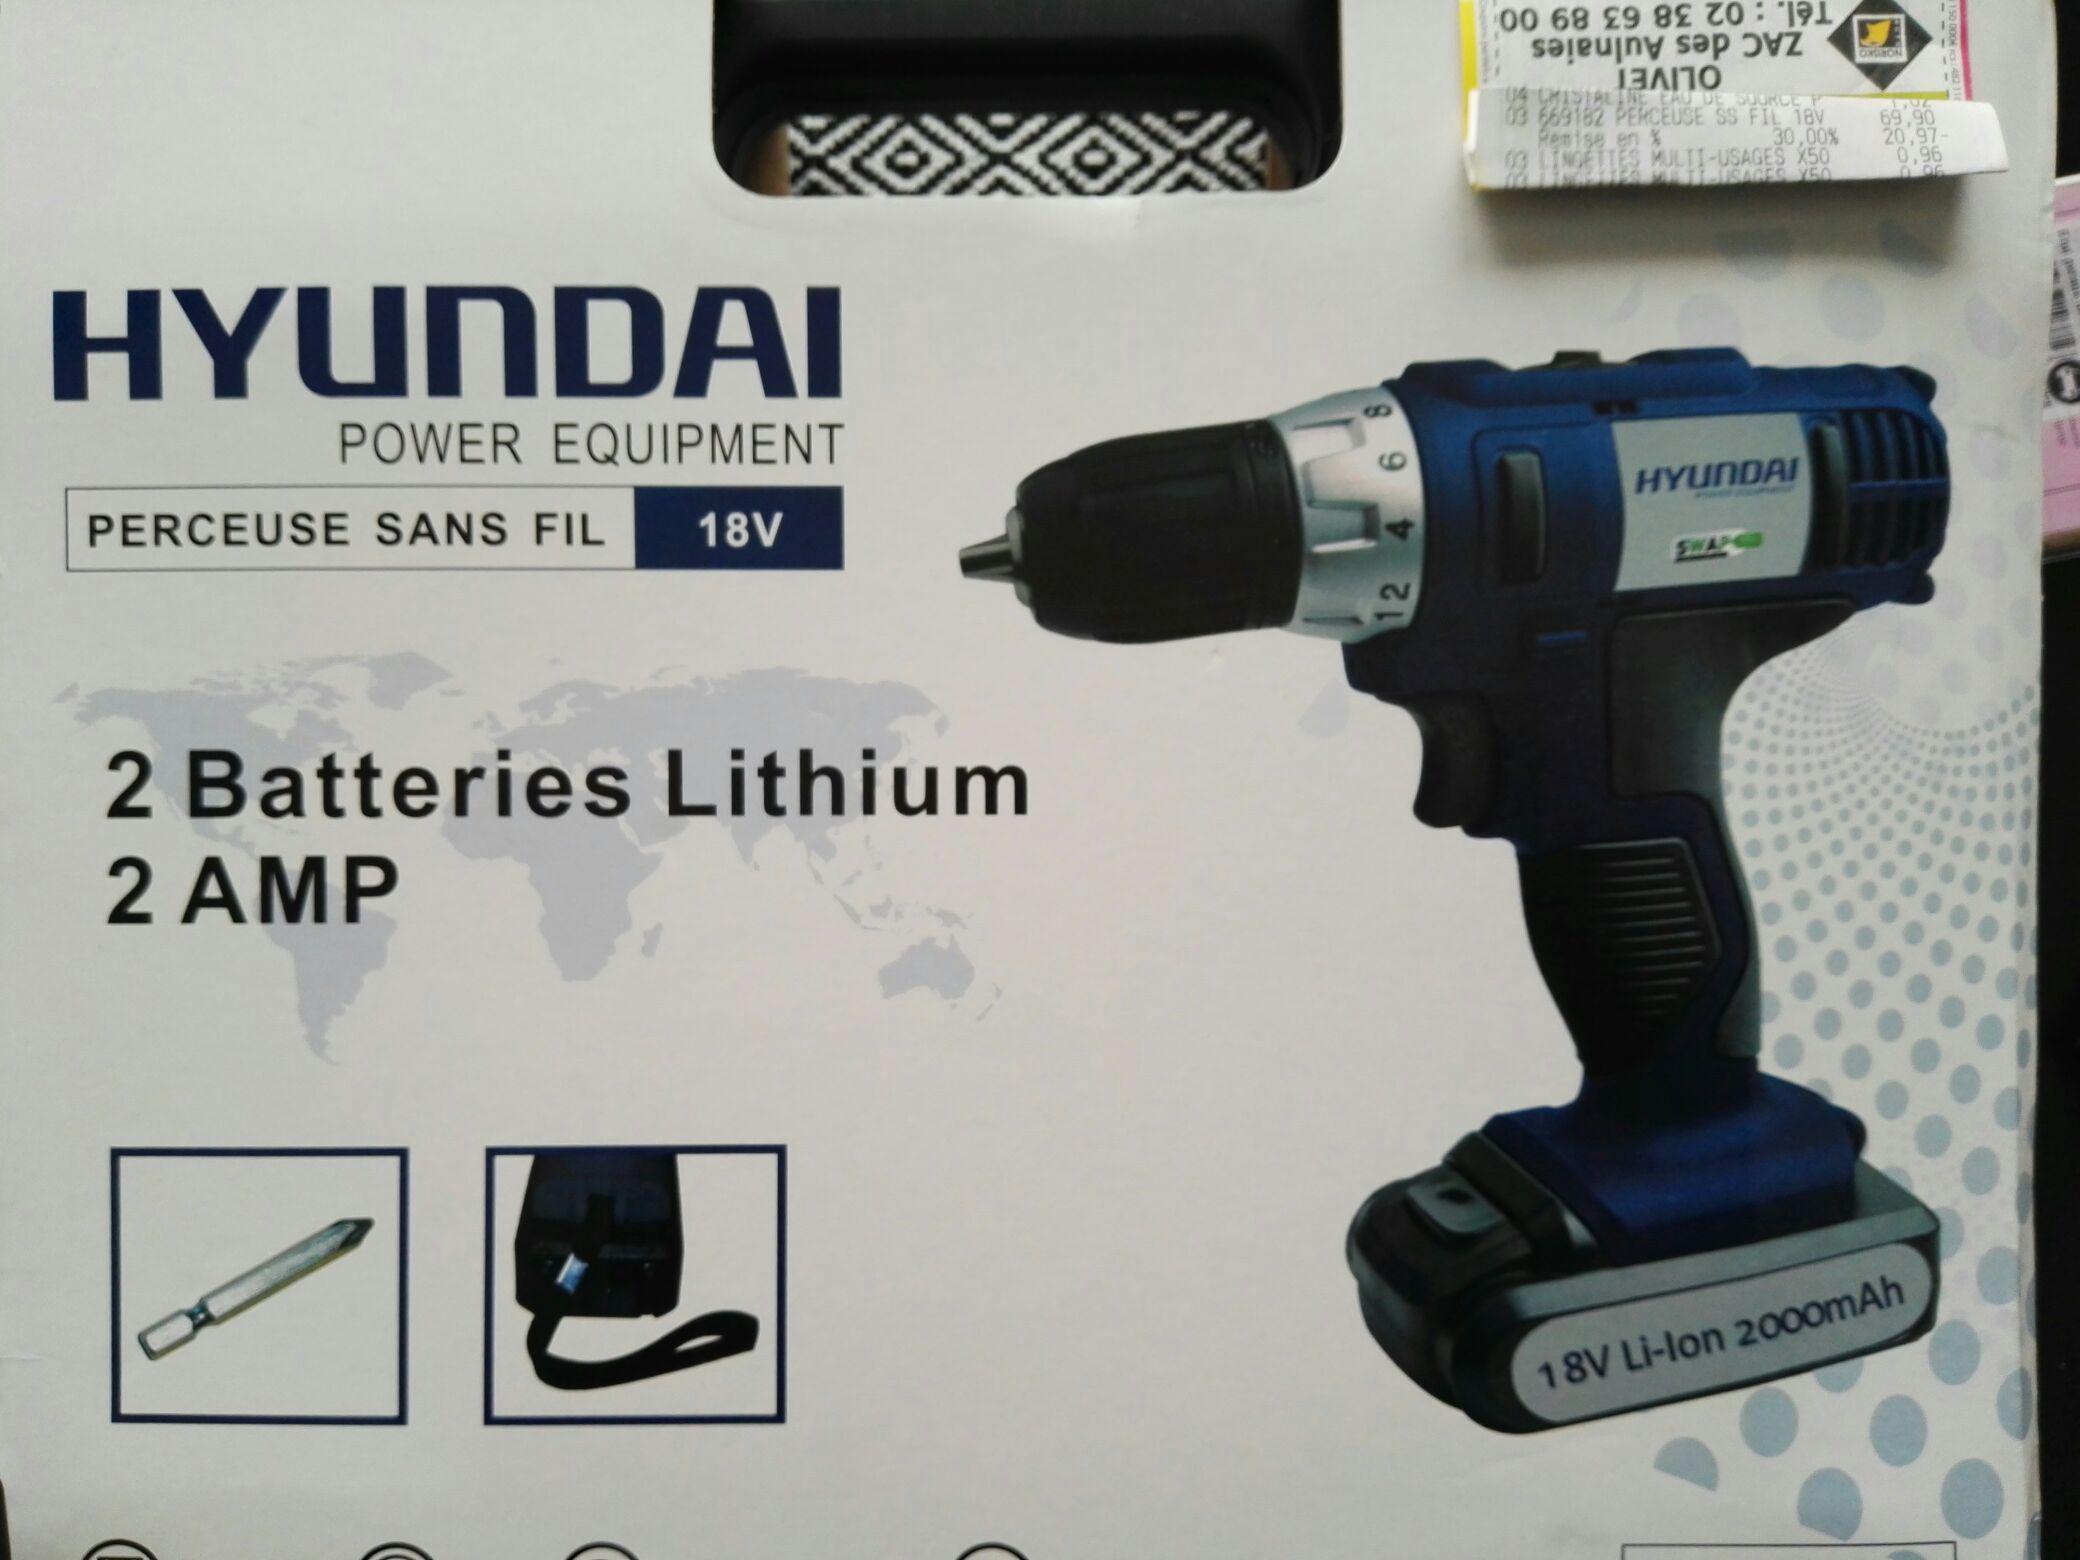 Perceuse sans fil Hyundai 18v 2.0Ah